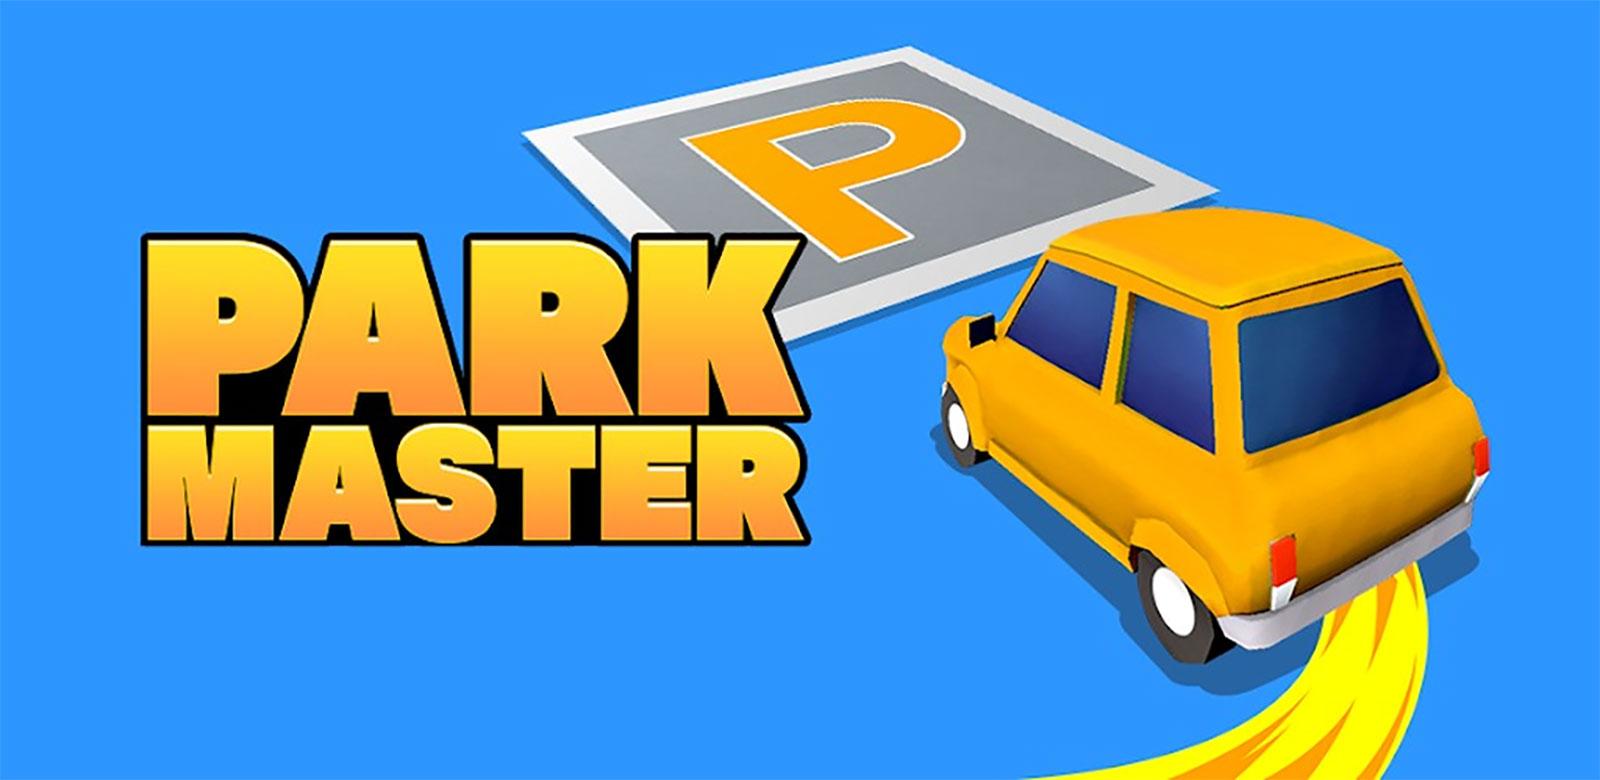 Park Master Mod Apk